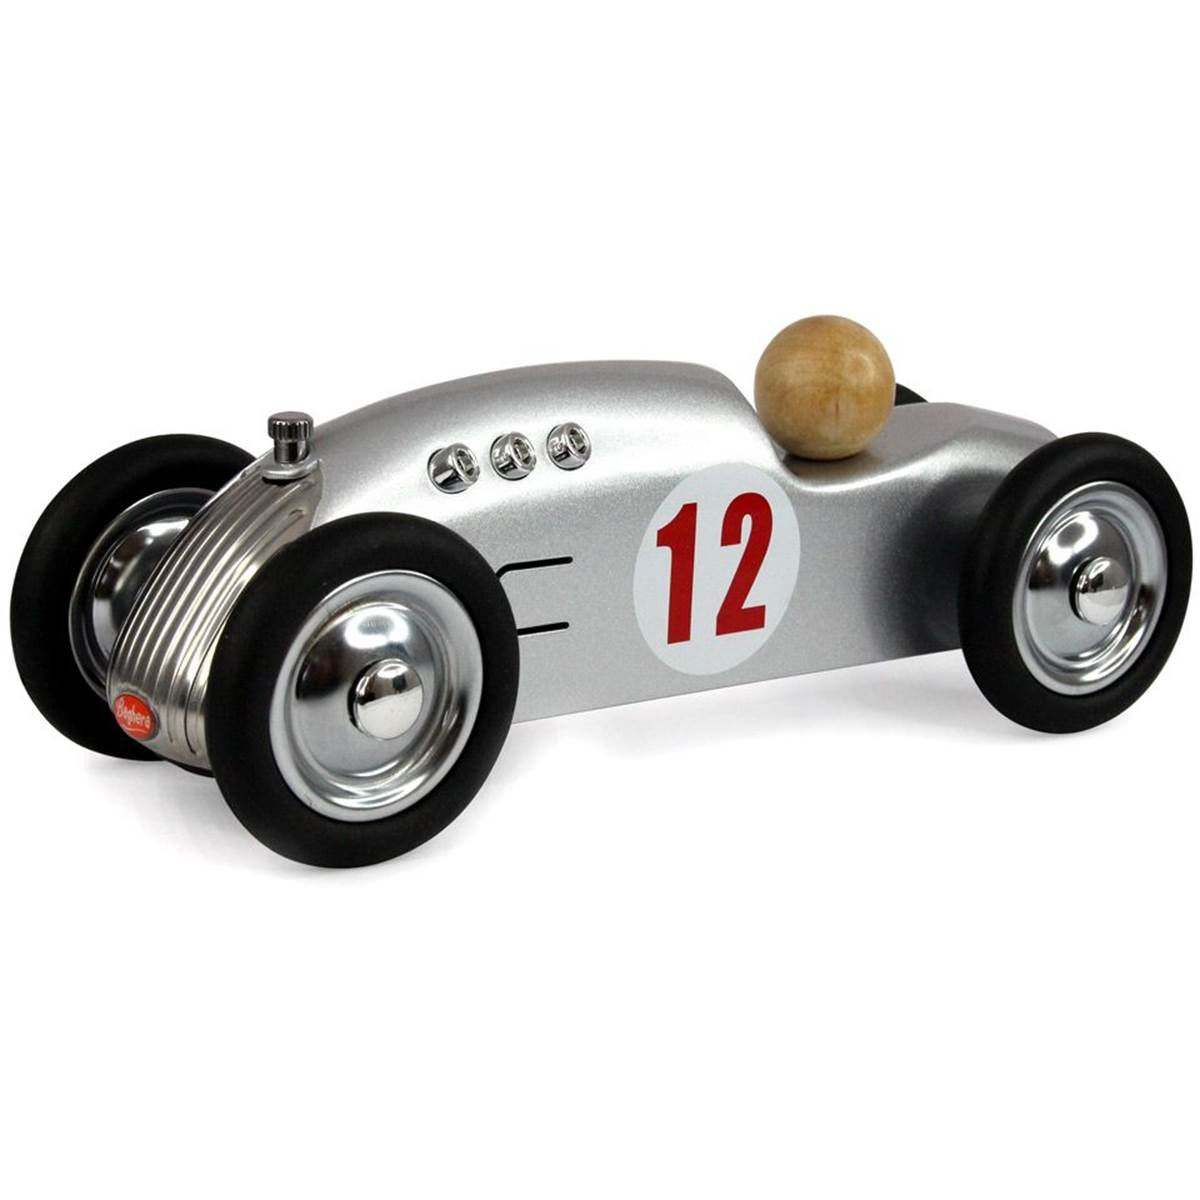 Mini voiture en métal Rocket silver Baghera